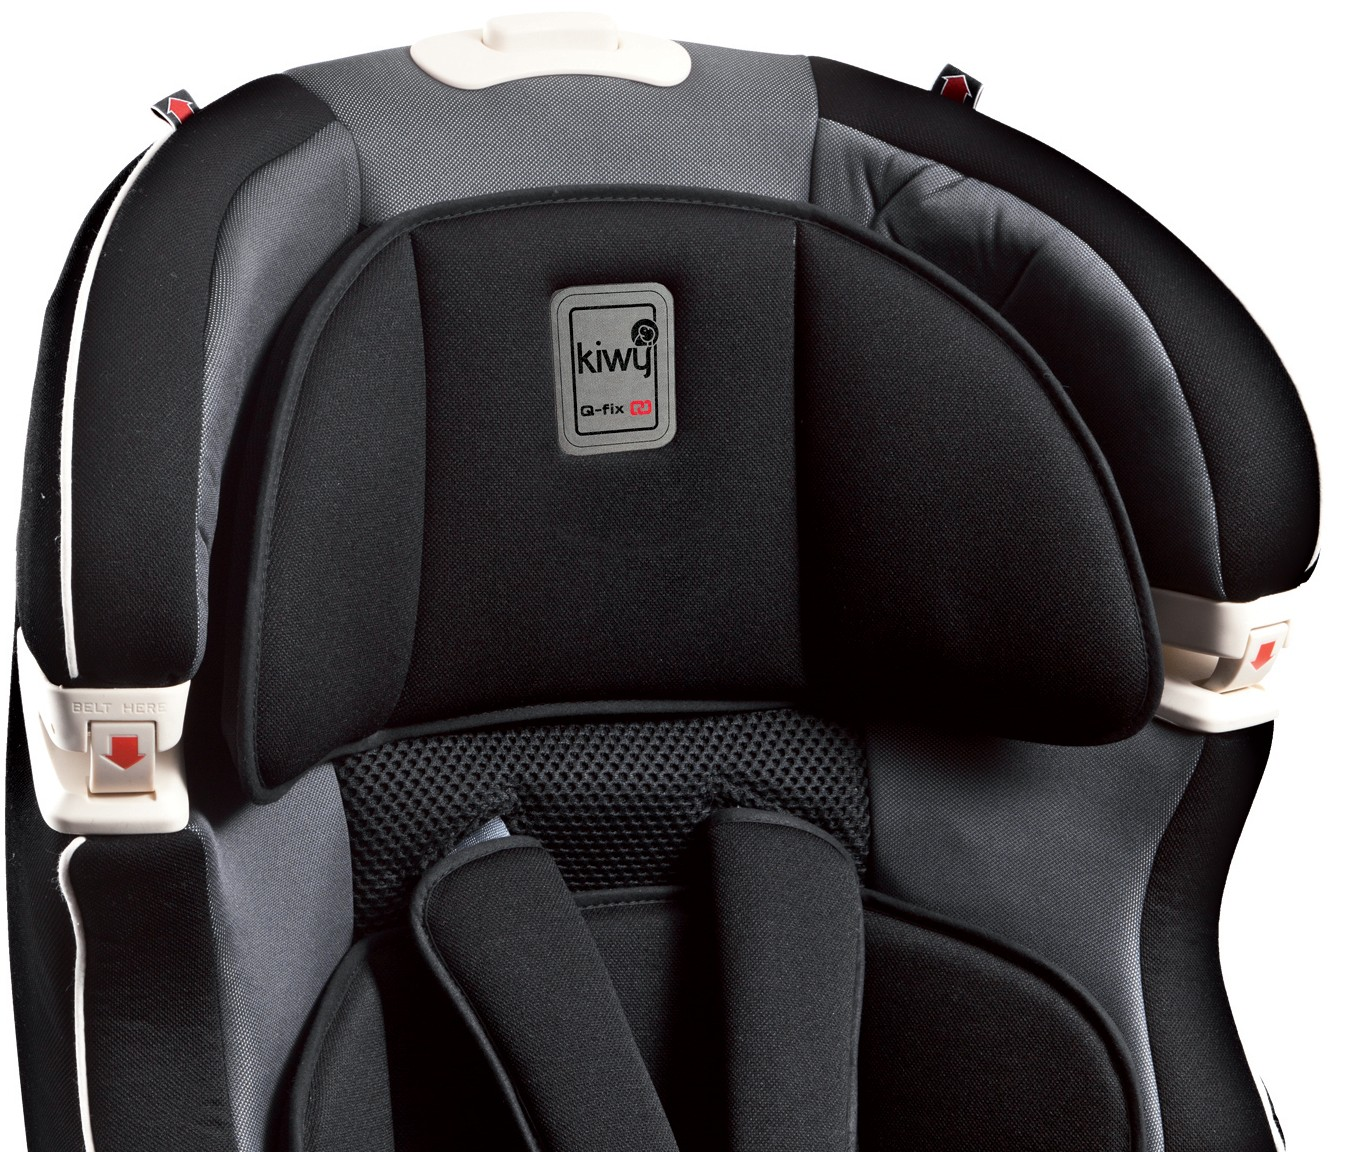 babytop24 kiwy autositz slf123 mit q fix adapter f r isofix carbon. Black Bedroom Furniture Sets. Home Design Ideas